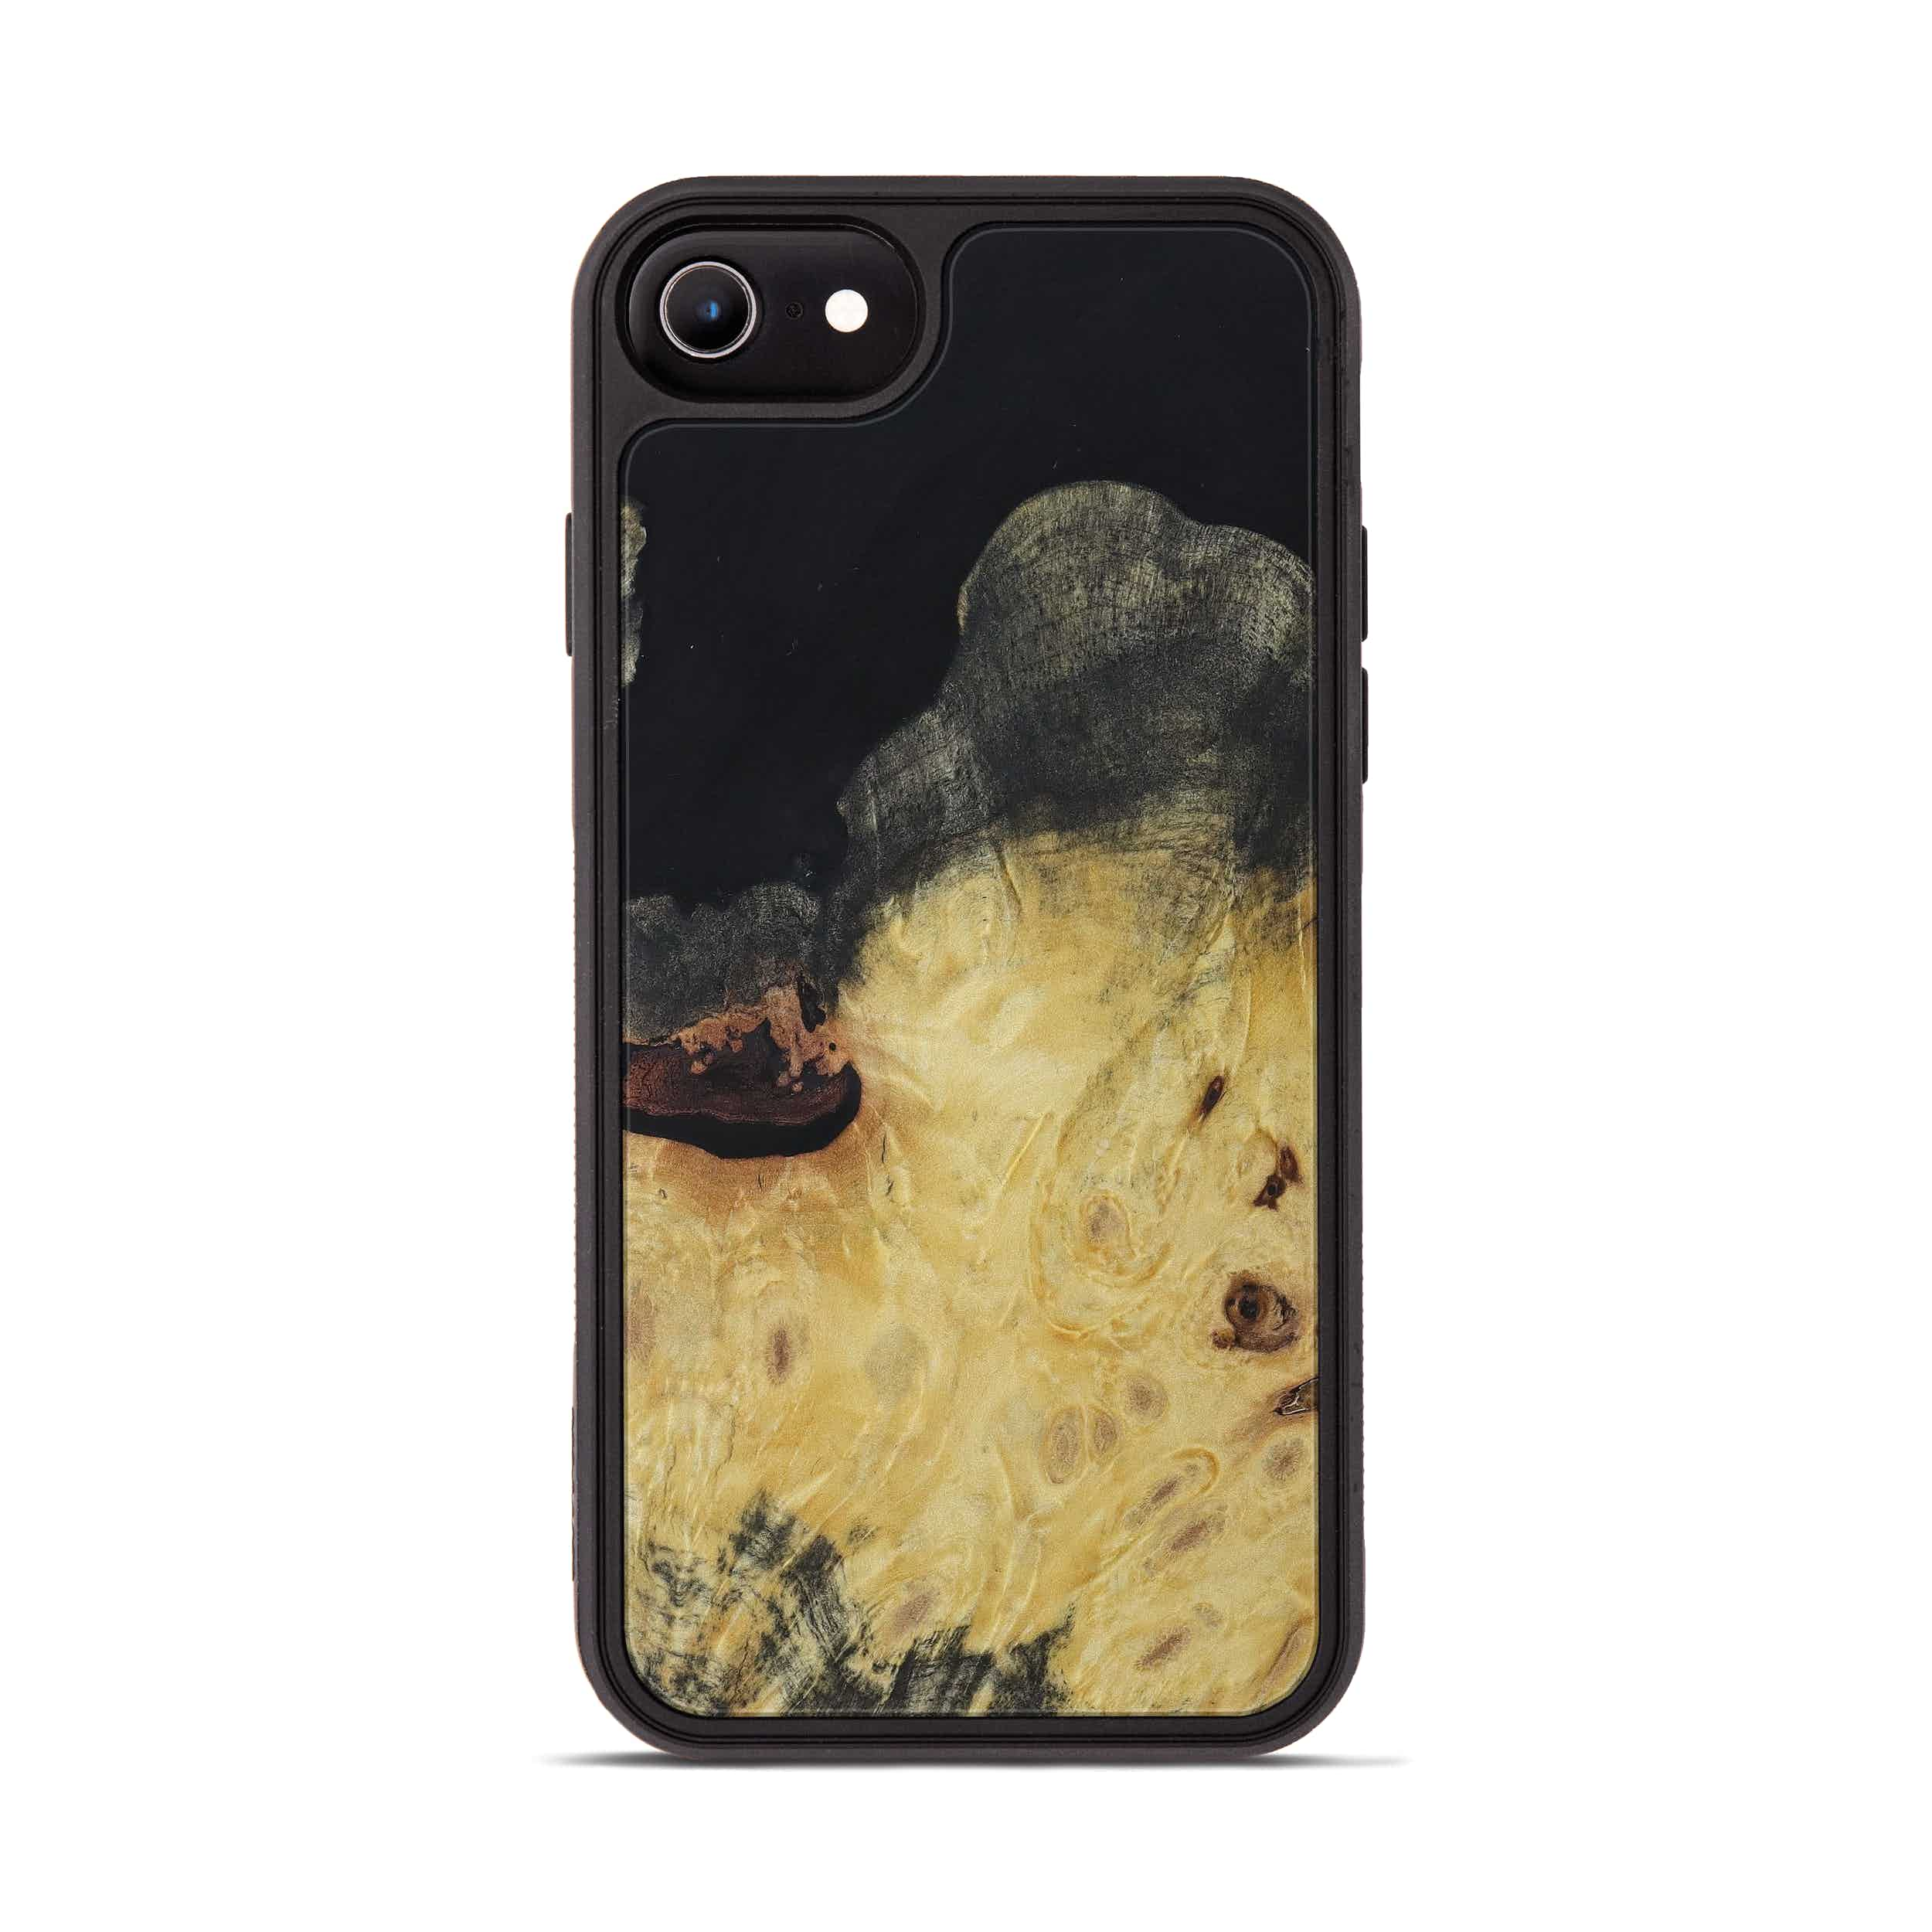 iPhone 6s Wood+Resin Phone Case - Ammar (Pure Black, 397844)